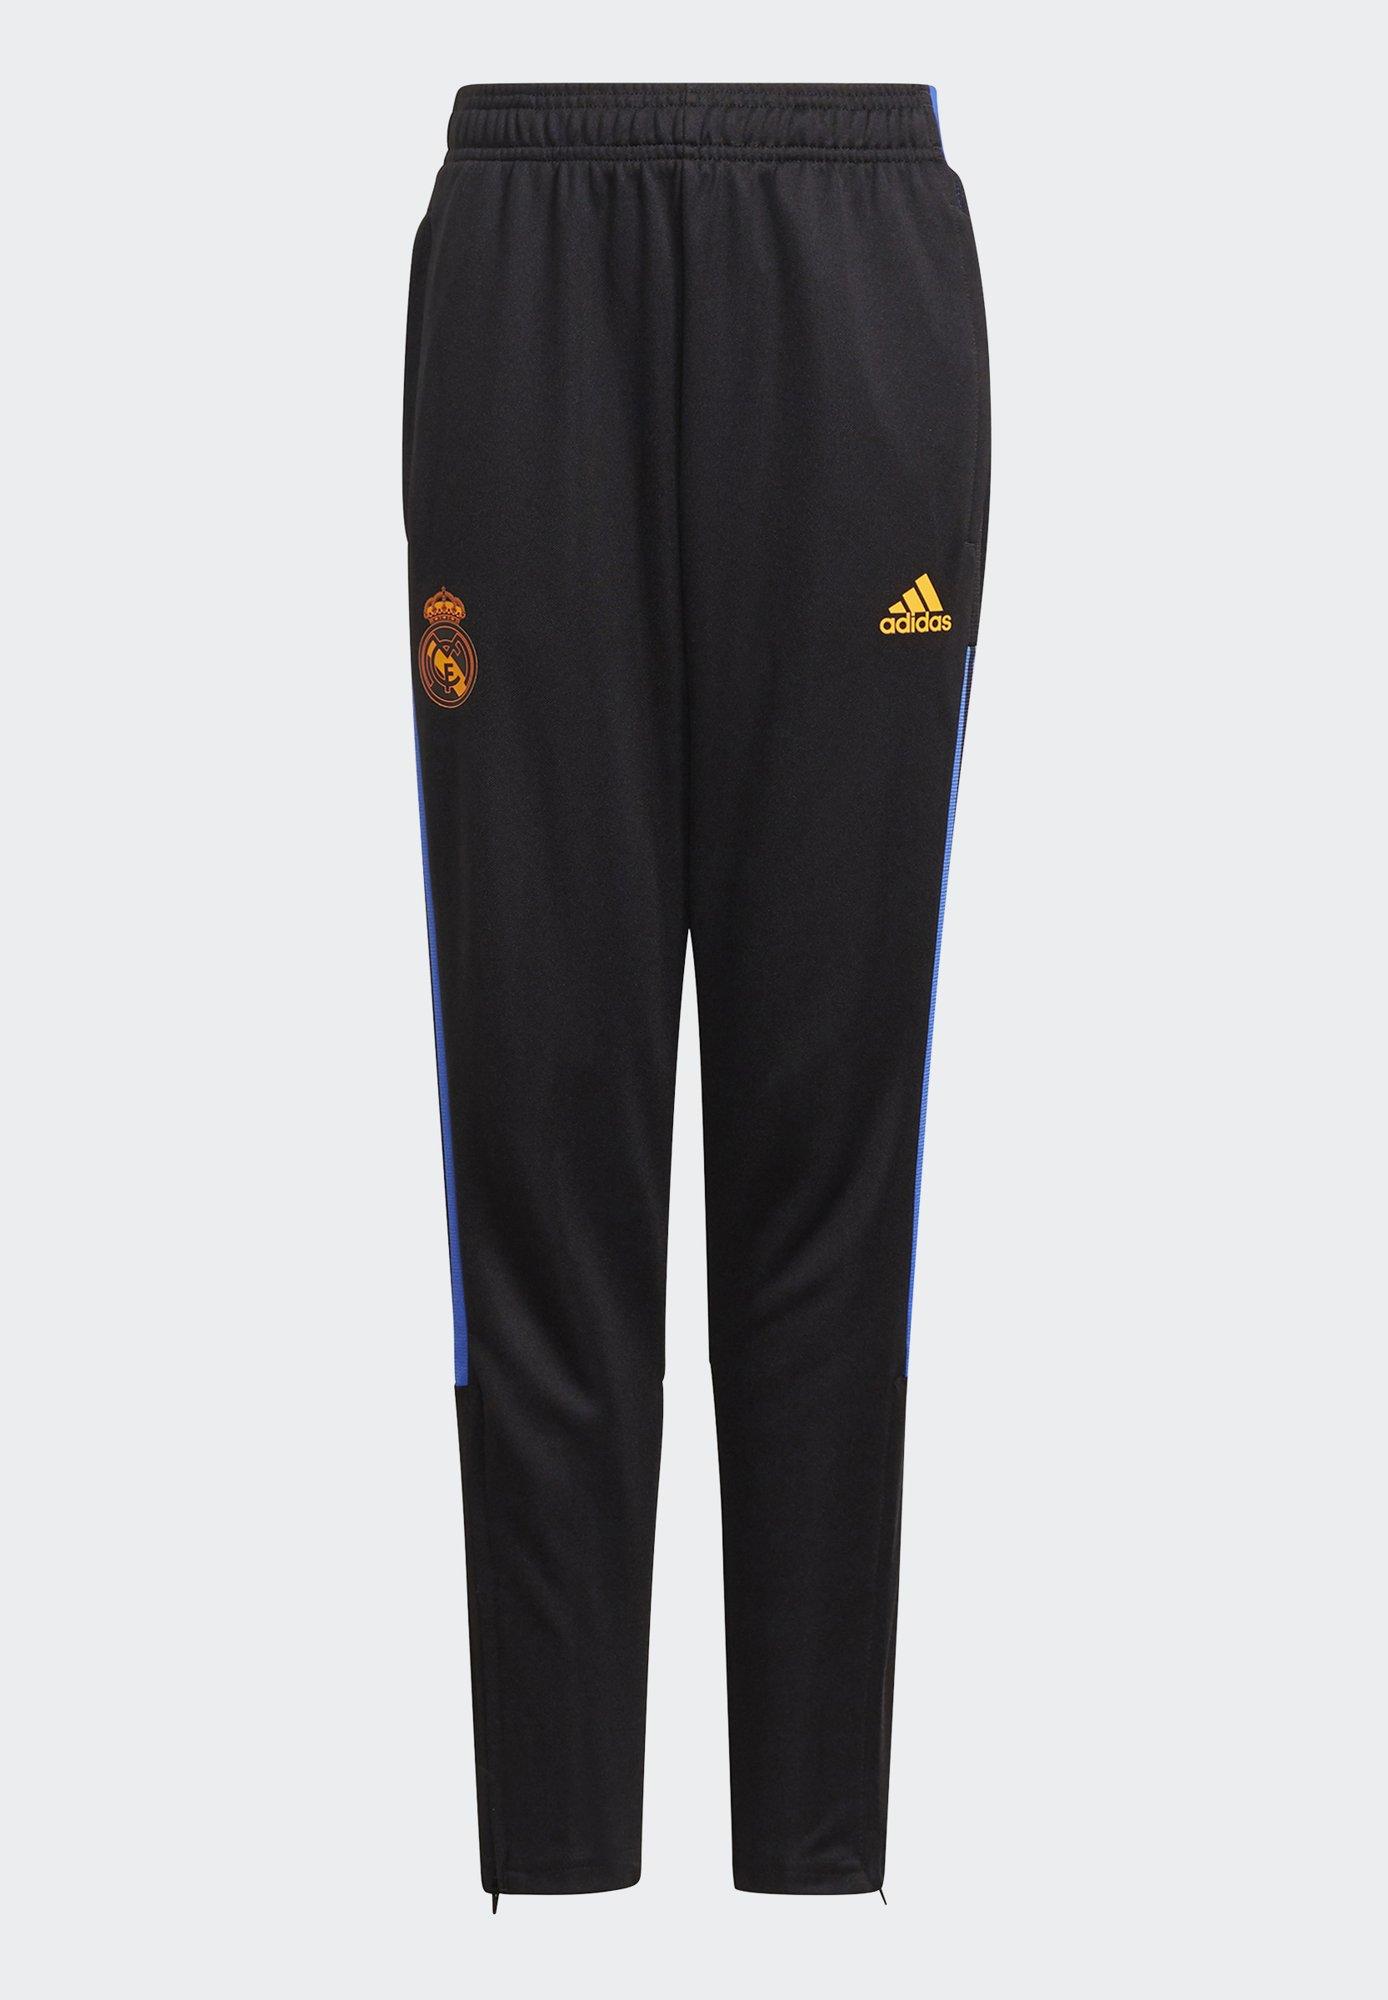 Kids REAL Y FOOTBALL MADRID AEROREADY PRIMEGREEN PANTS - Tracksuit bottoms